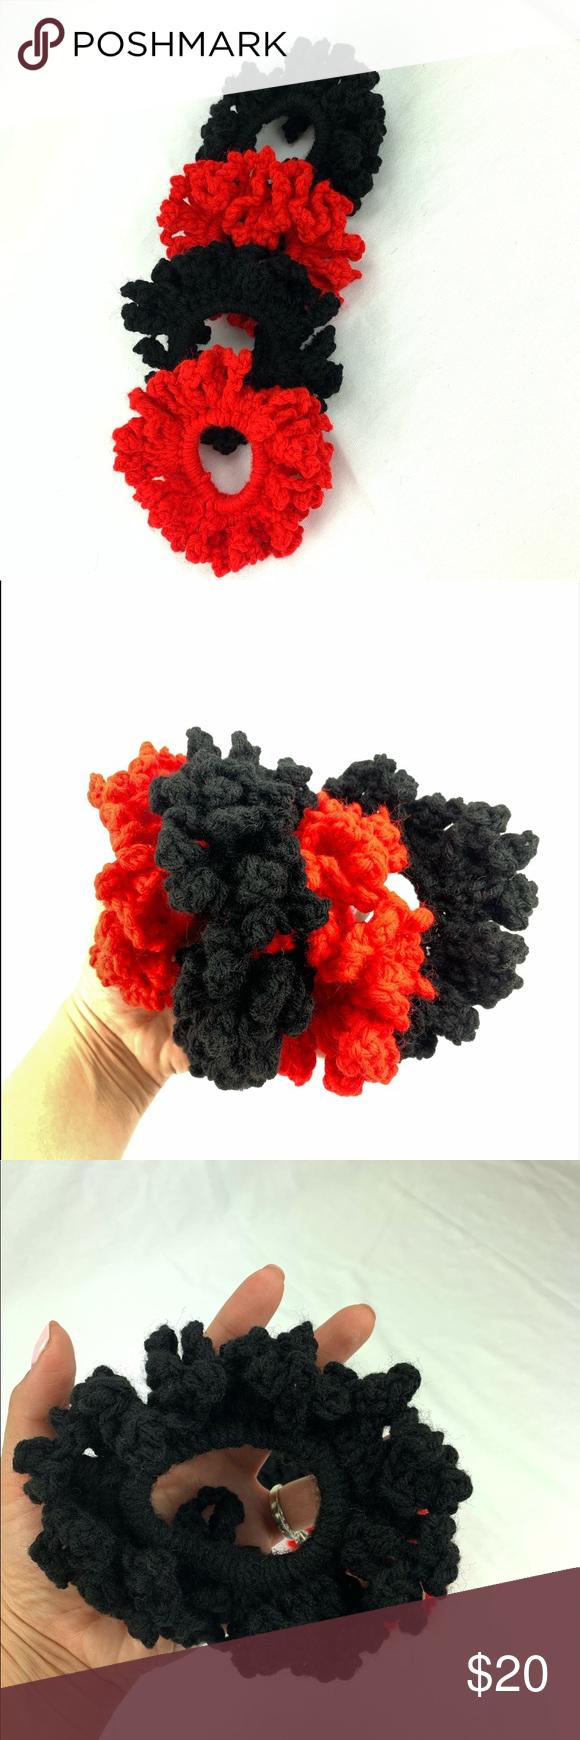 Set of 4 Handmade Crochet scrunchies - maximum stretch -XL Scrunchies -Handmade Accessories Hair Accessories #crochetscrunchies Set of 4 Handmade Crochet scrunchies - maximum stretch -XL Scrunchies -Handmade Accessories Hair Accessories #crochetscrunchies